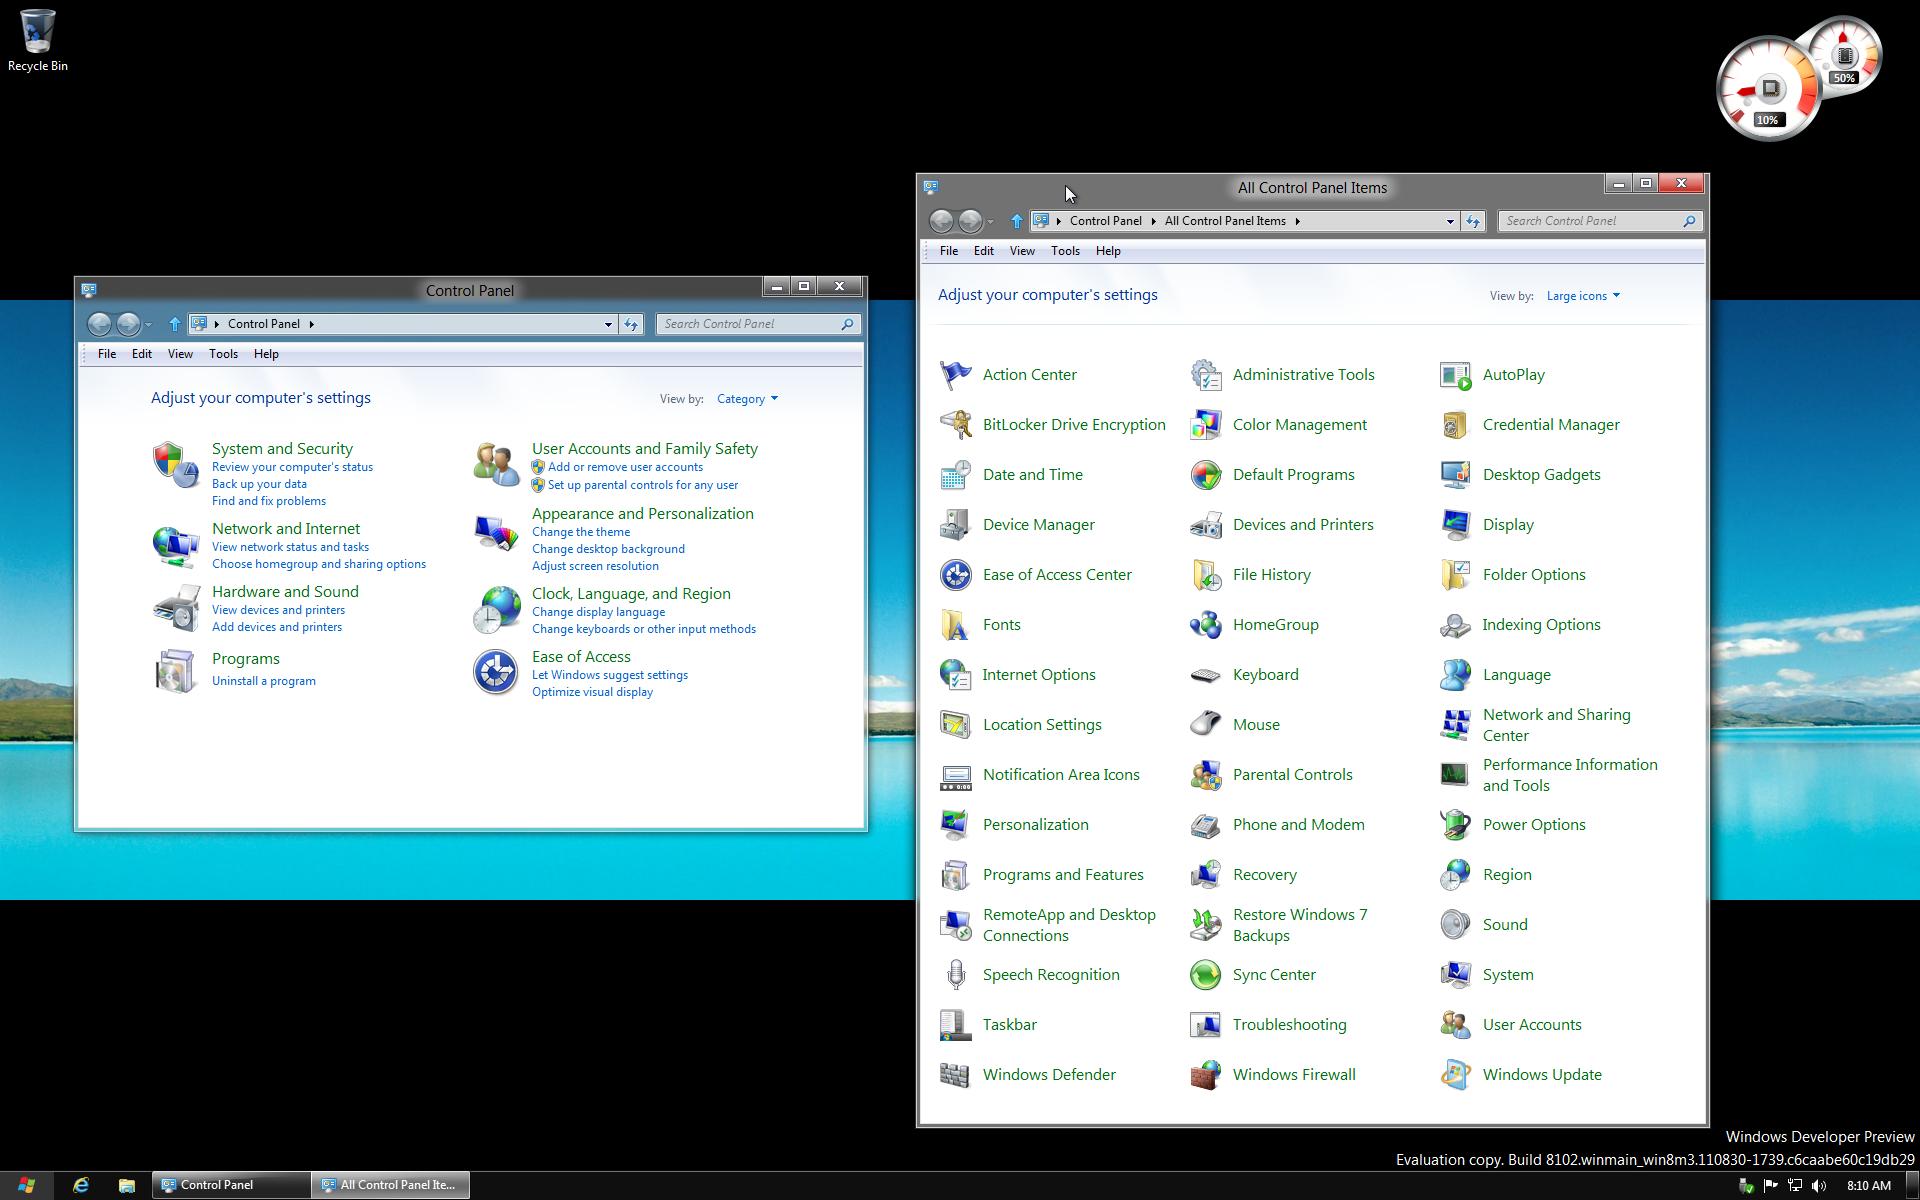 Windows 10 klassischer desktop anzeigen